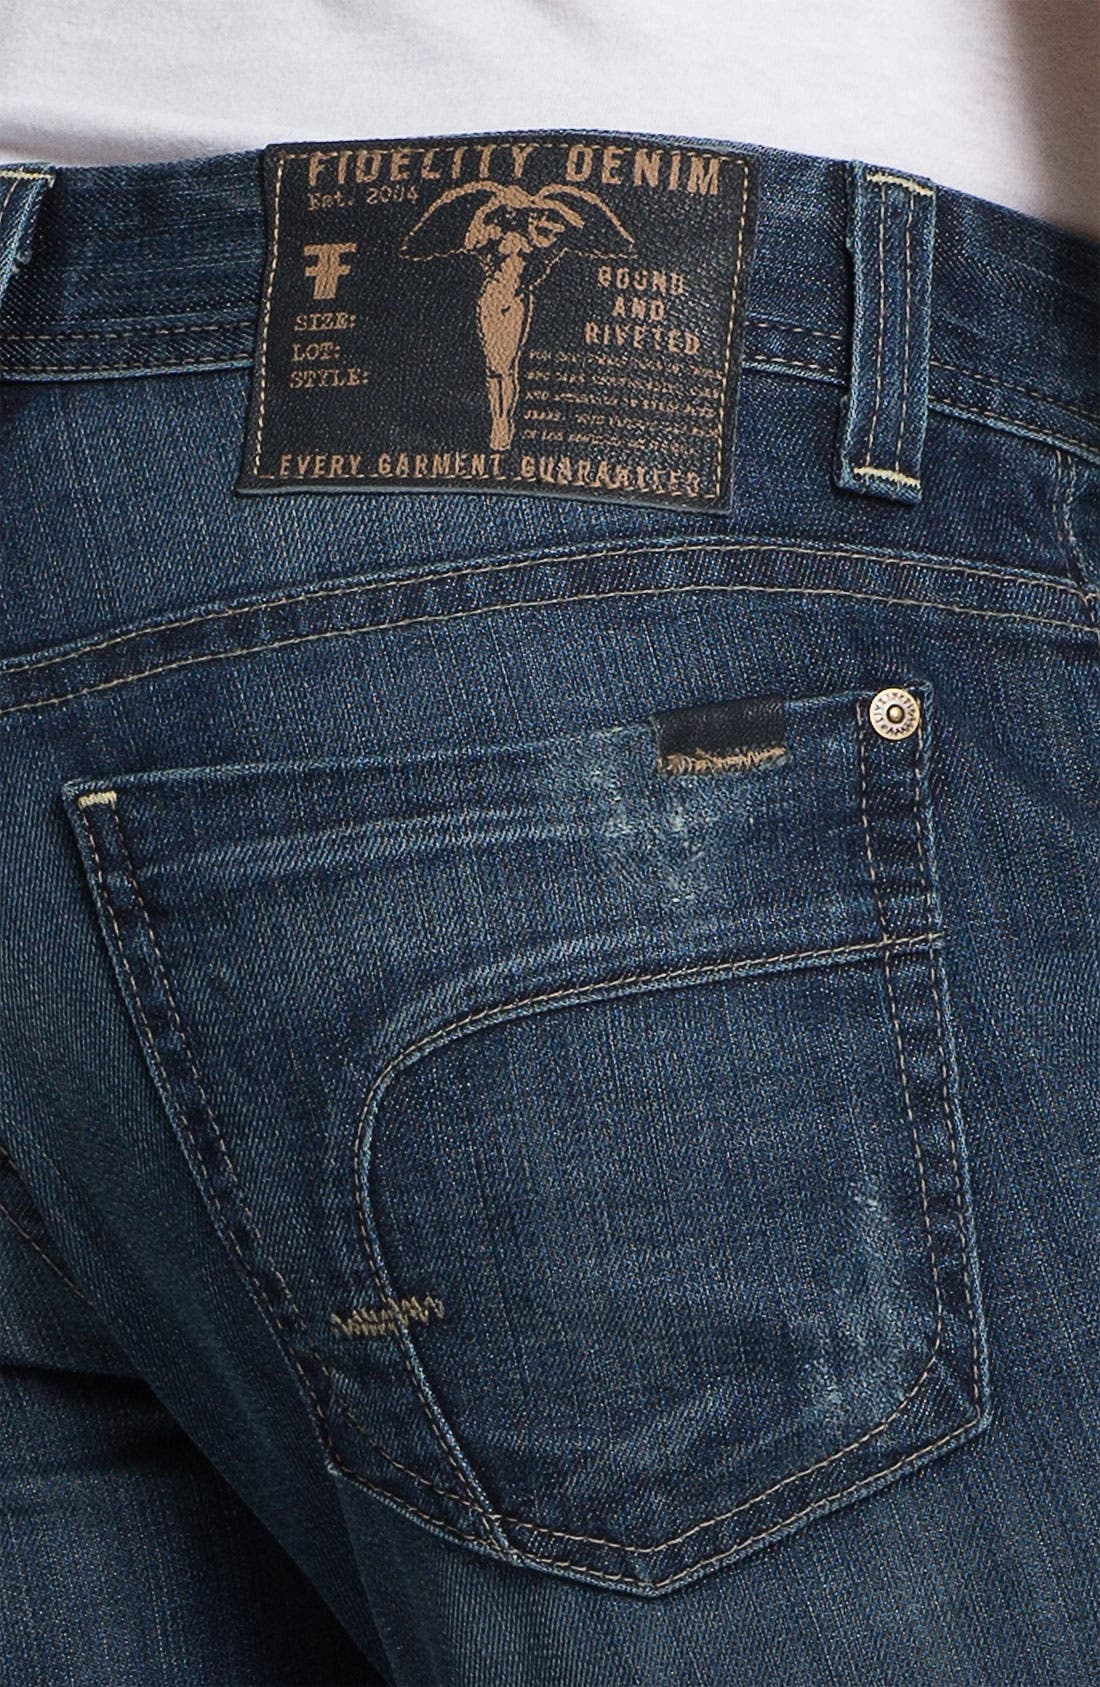 Alternate Image 4  - Fidelity Denim 'Slim Jim' Slim Straight Leg Jeans (Exile Vintage)